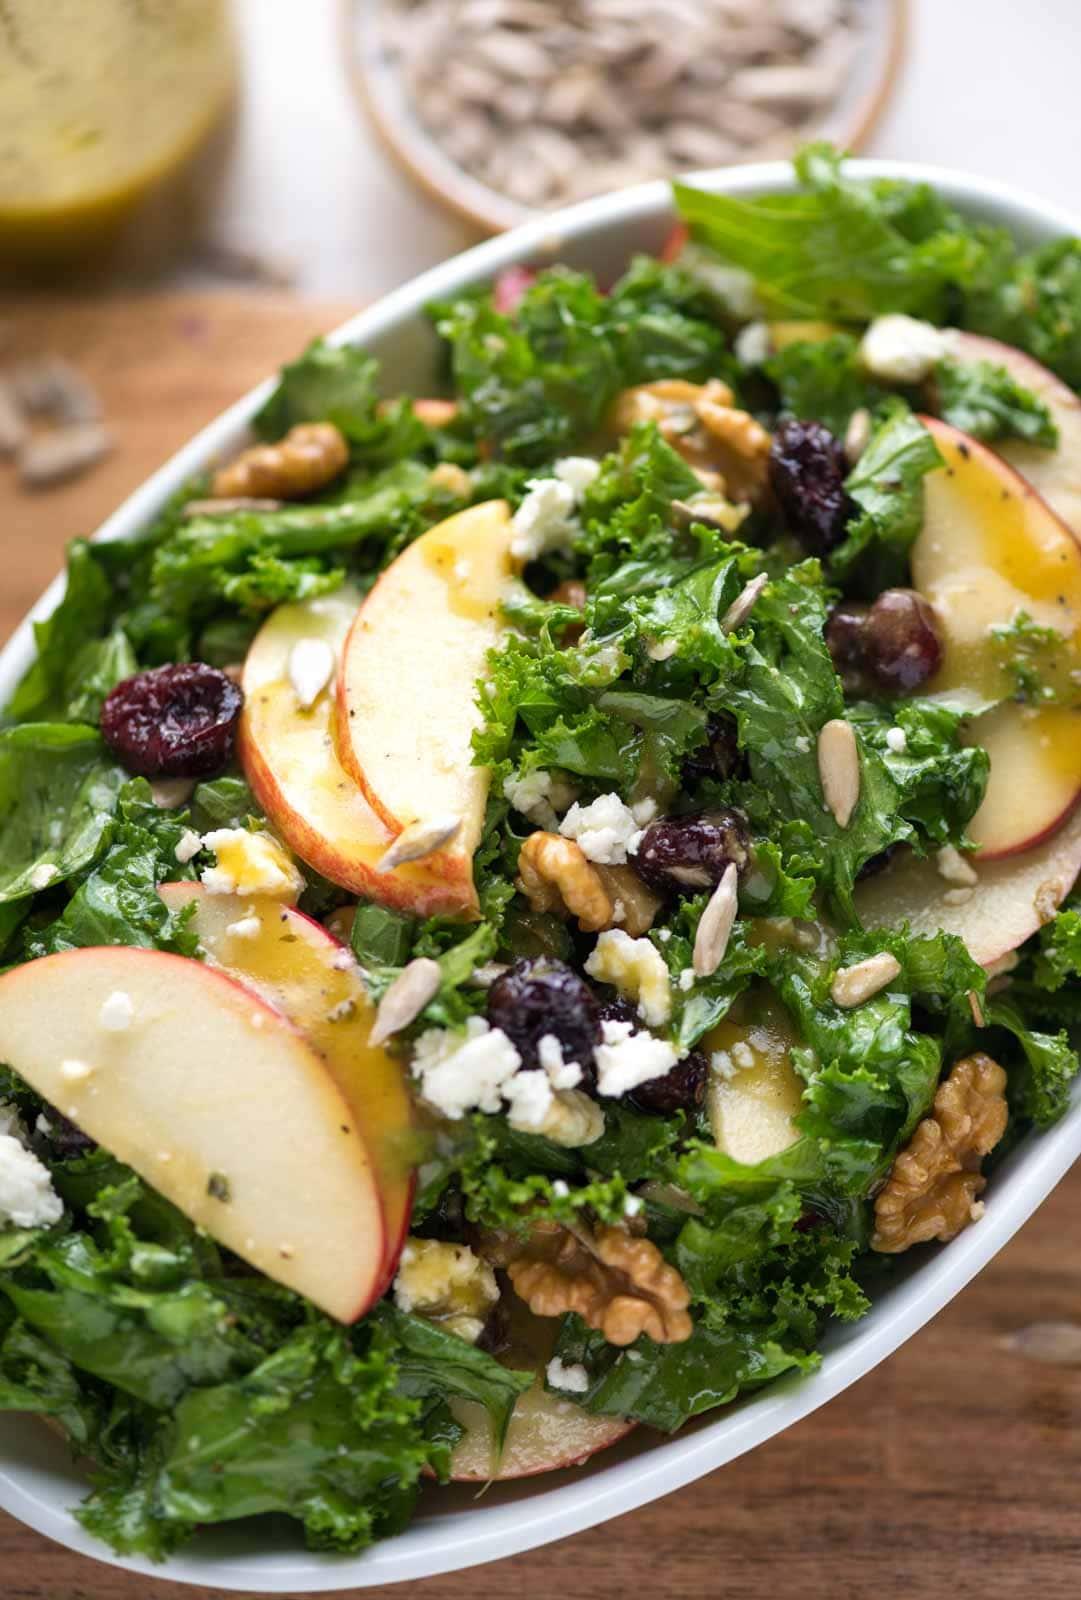 Bowl of Apple Kale Salad - Apple cider vinaigrette drizzled over Sliced apples, feta, walnut, cranberries and sunflower seeds.